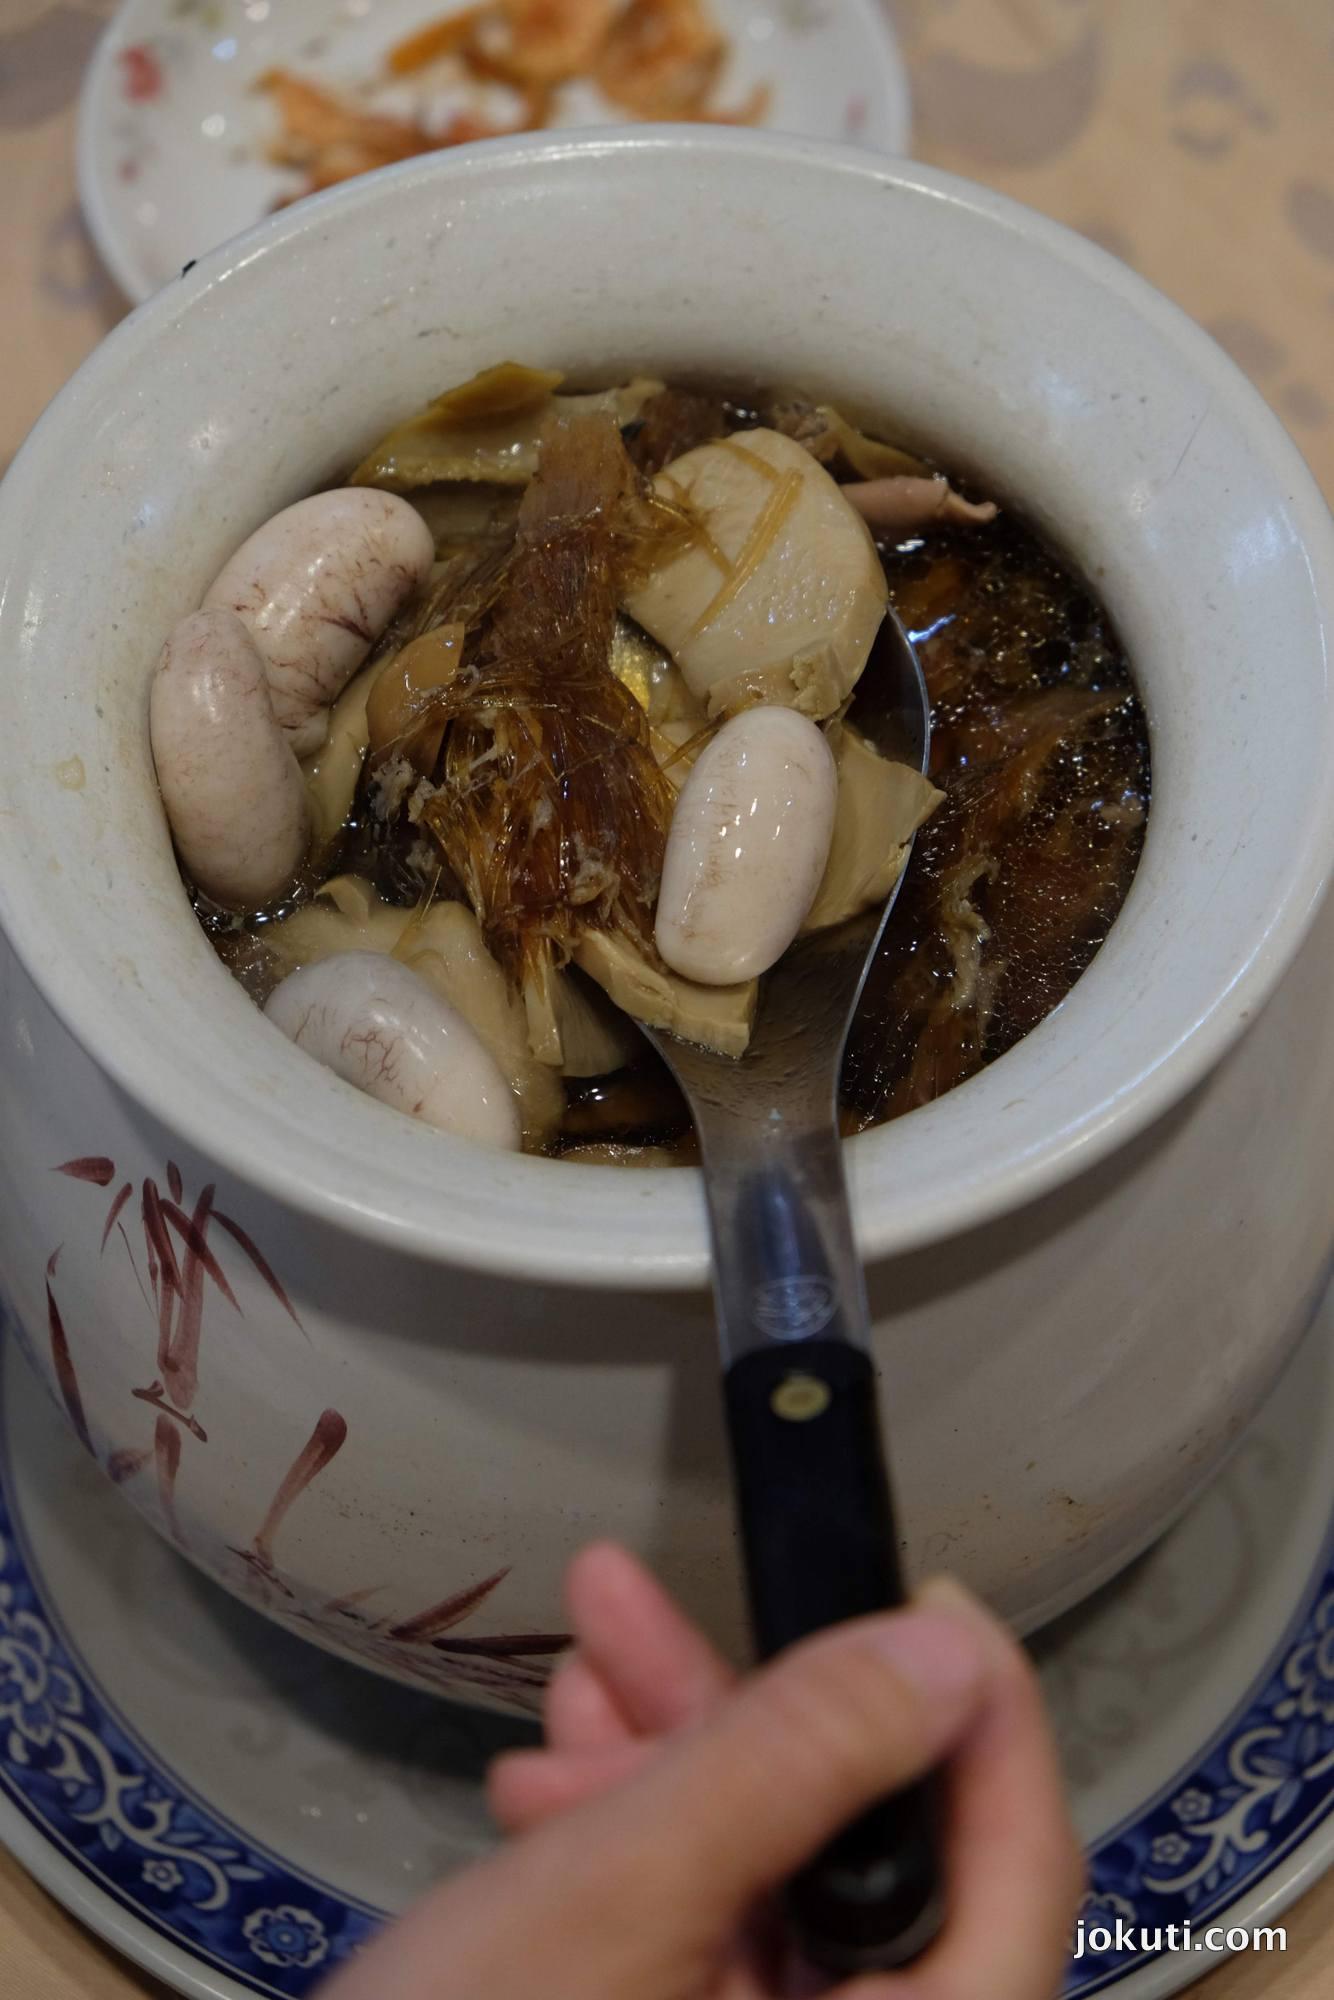 dscf2952_taipei_ming_fu_seafood_michelin_taiwan_vilagevo_jokuti.jpg